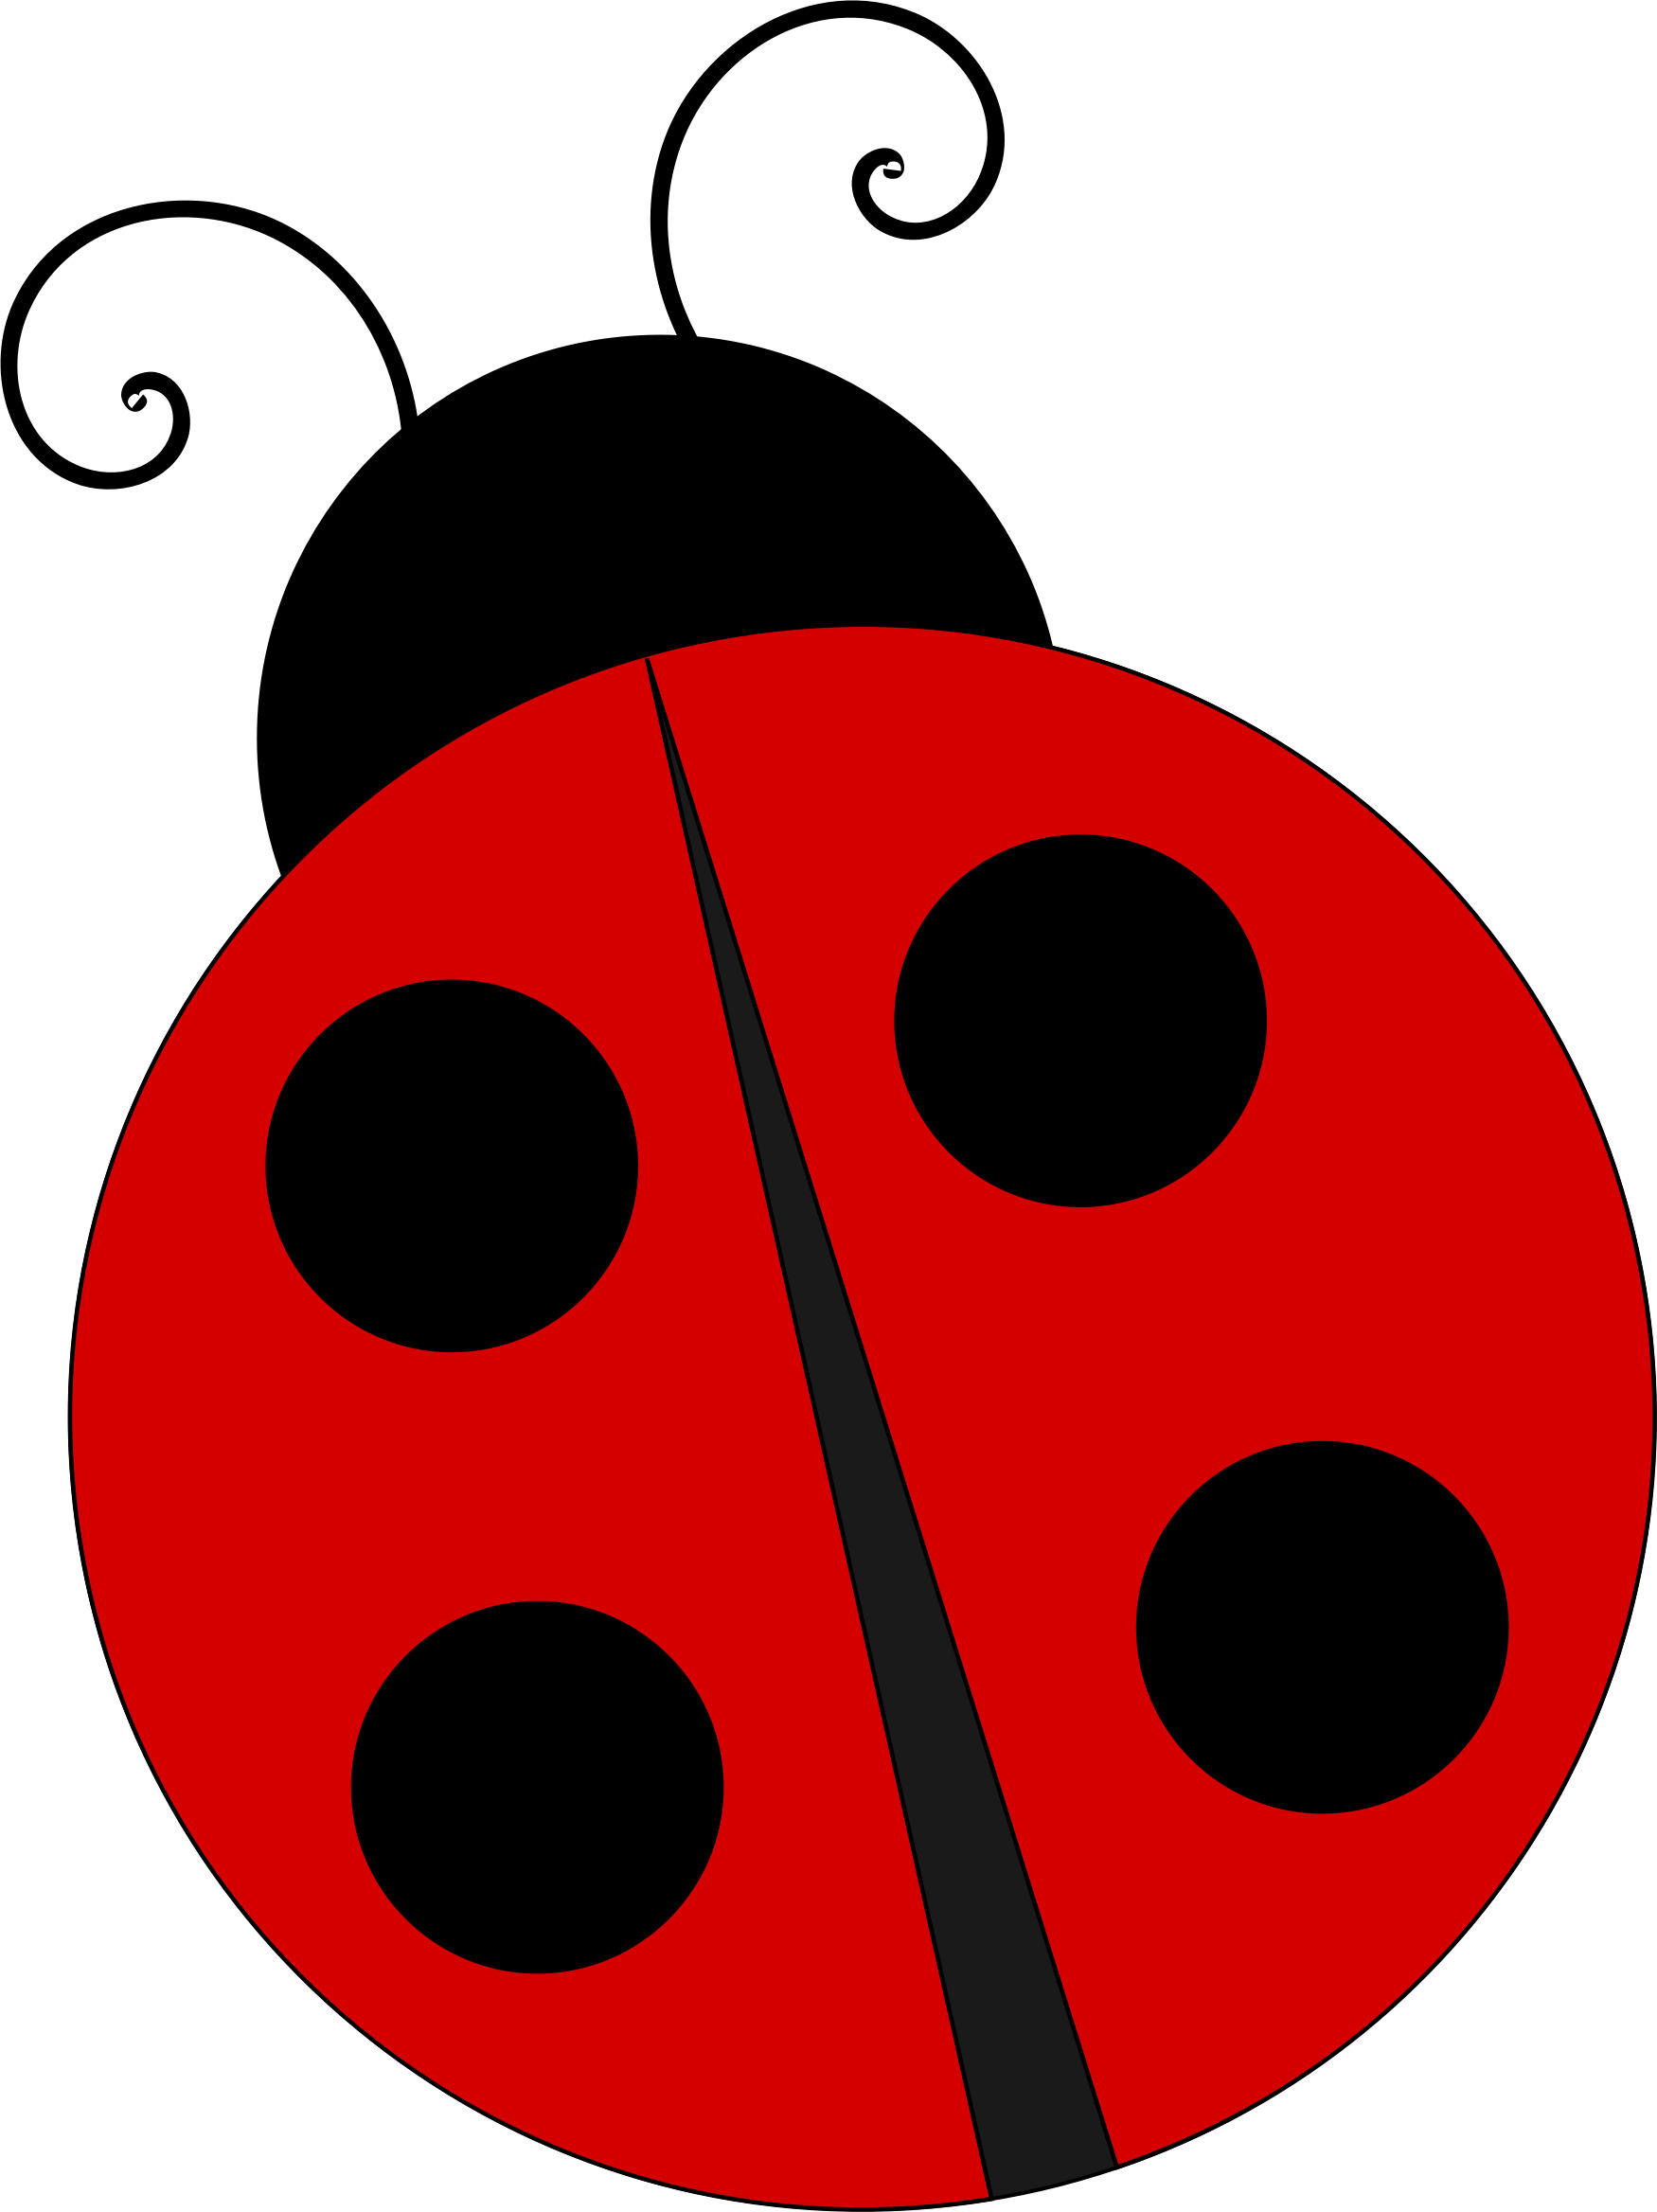 Clipart ladybug